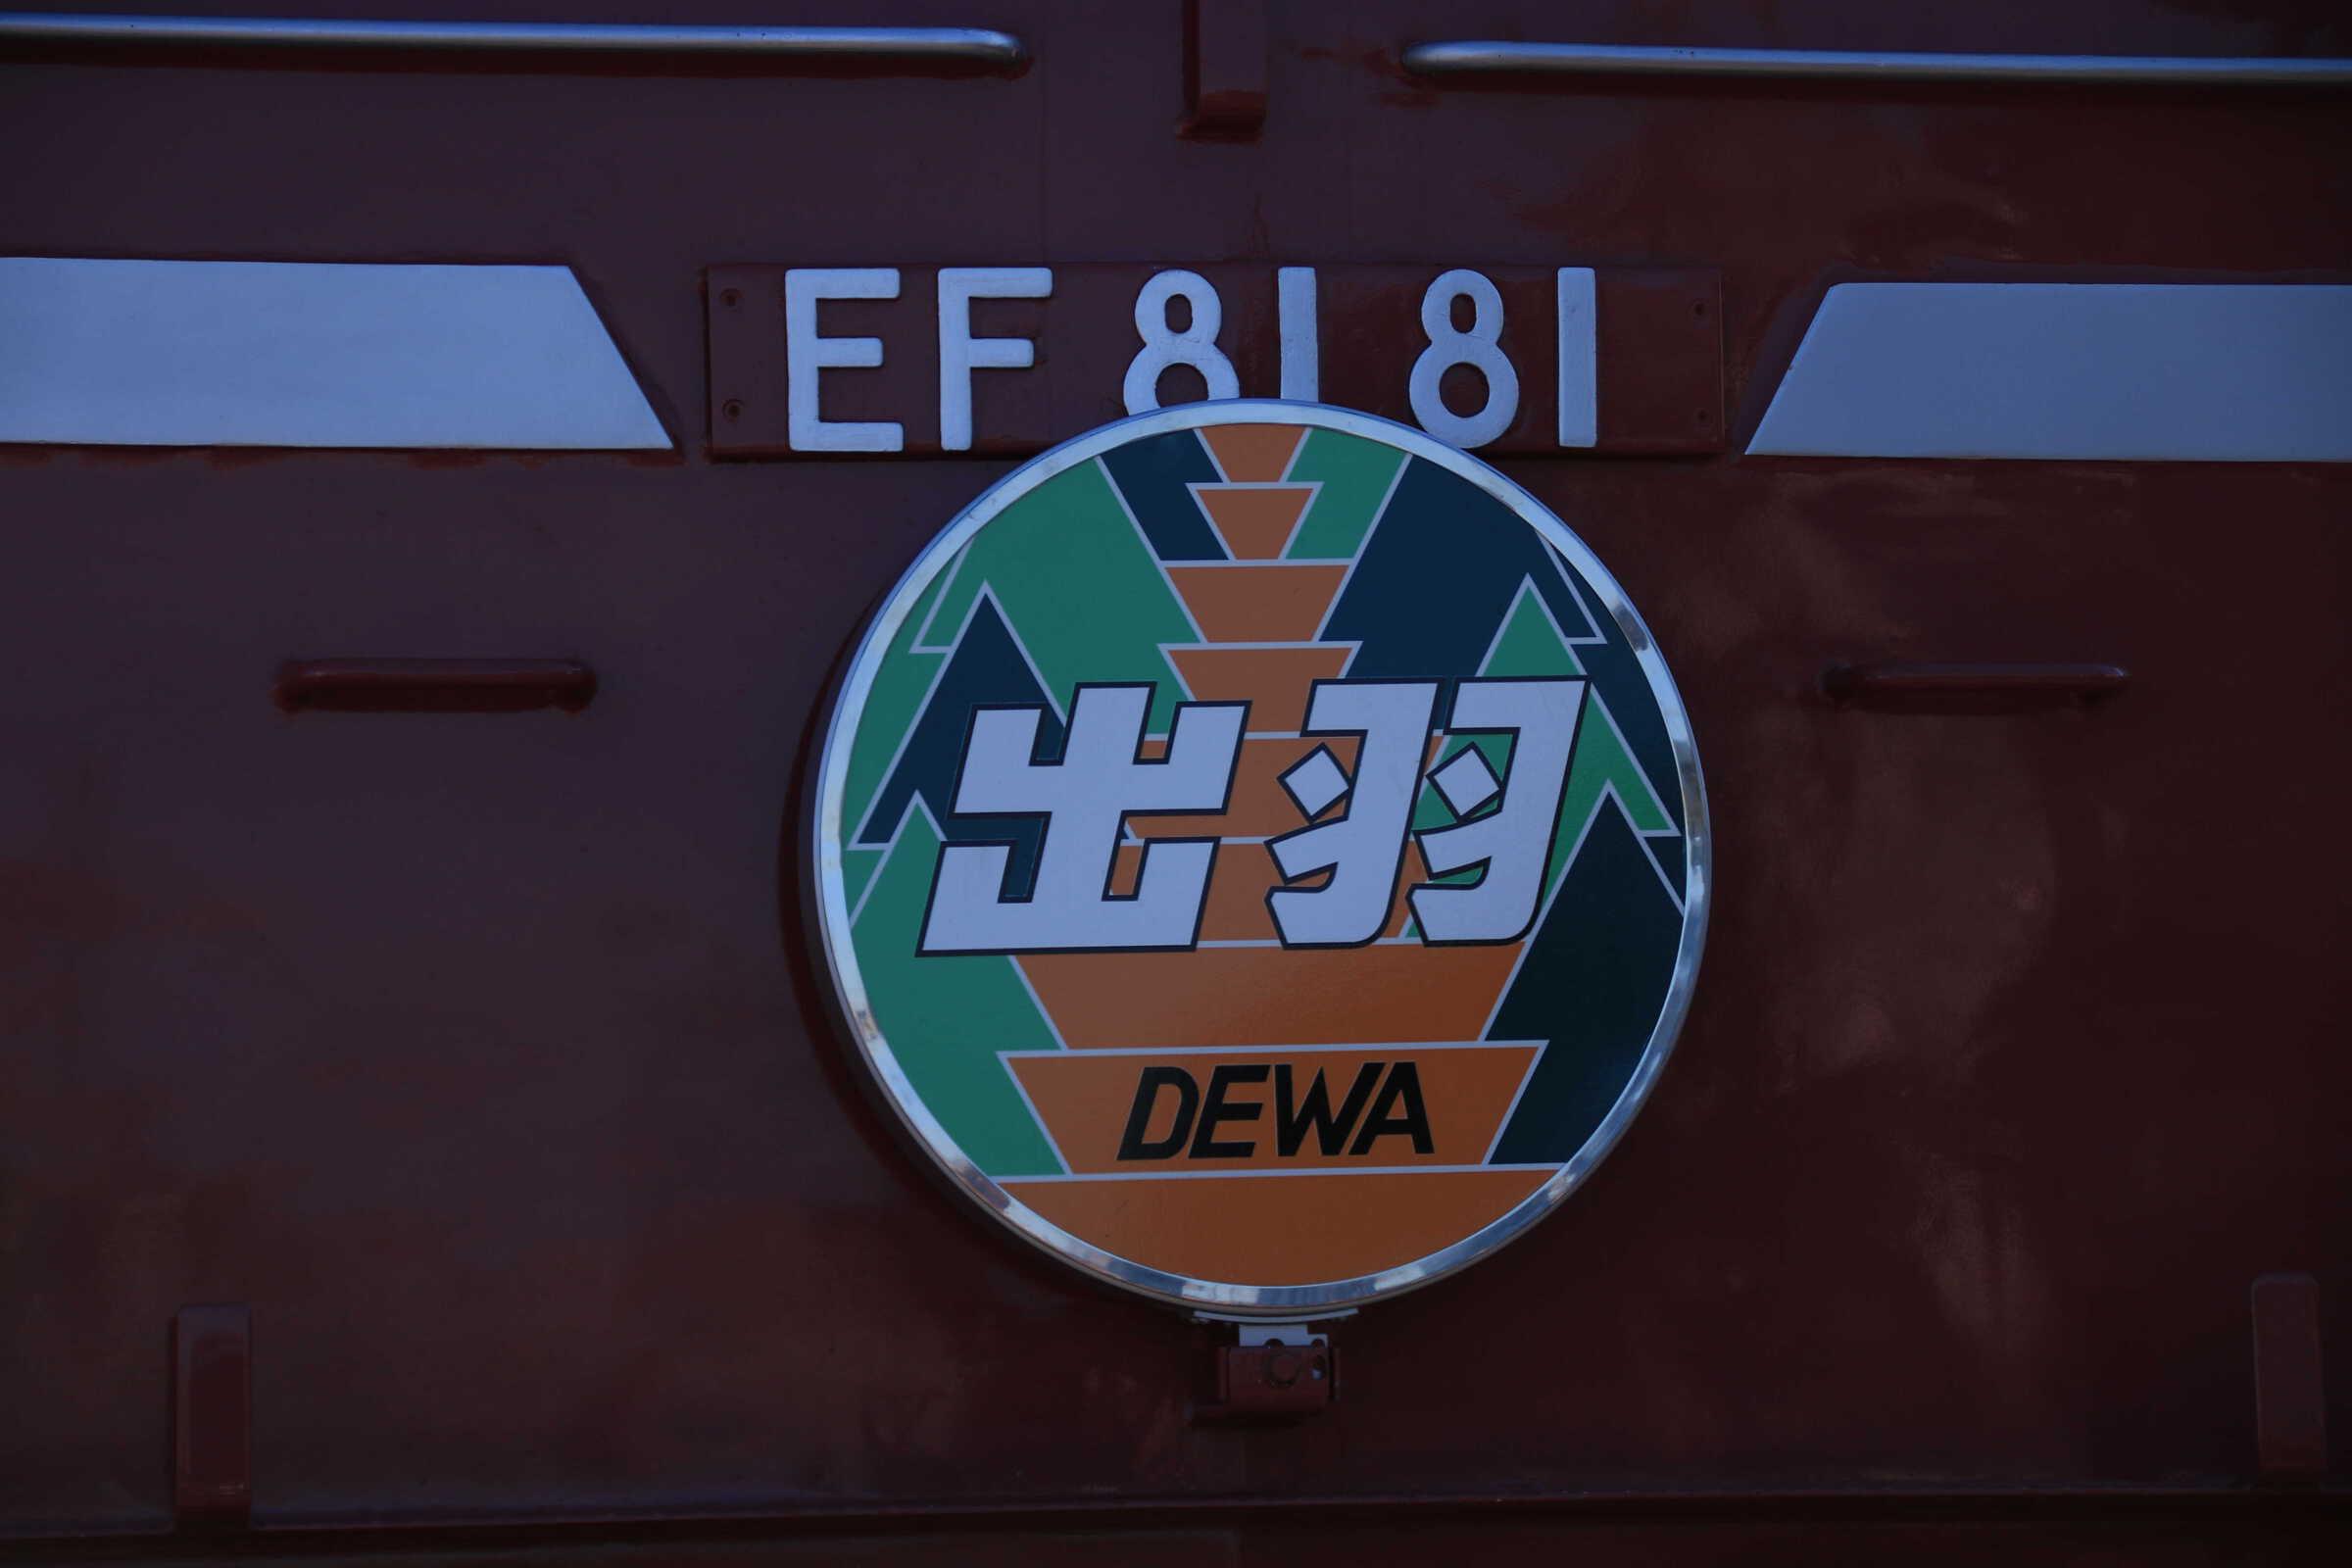 EF81-81[田]